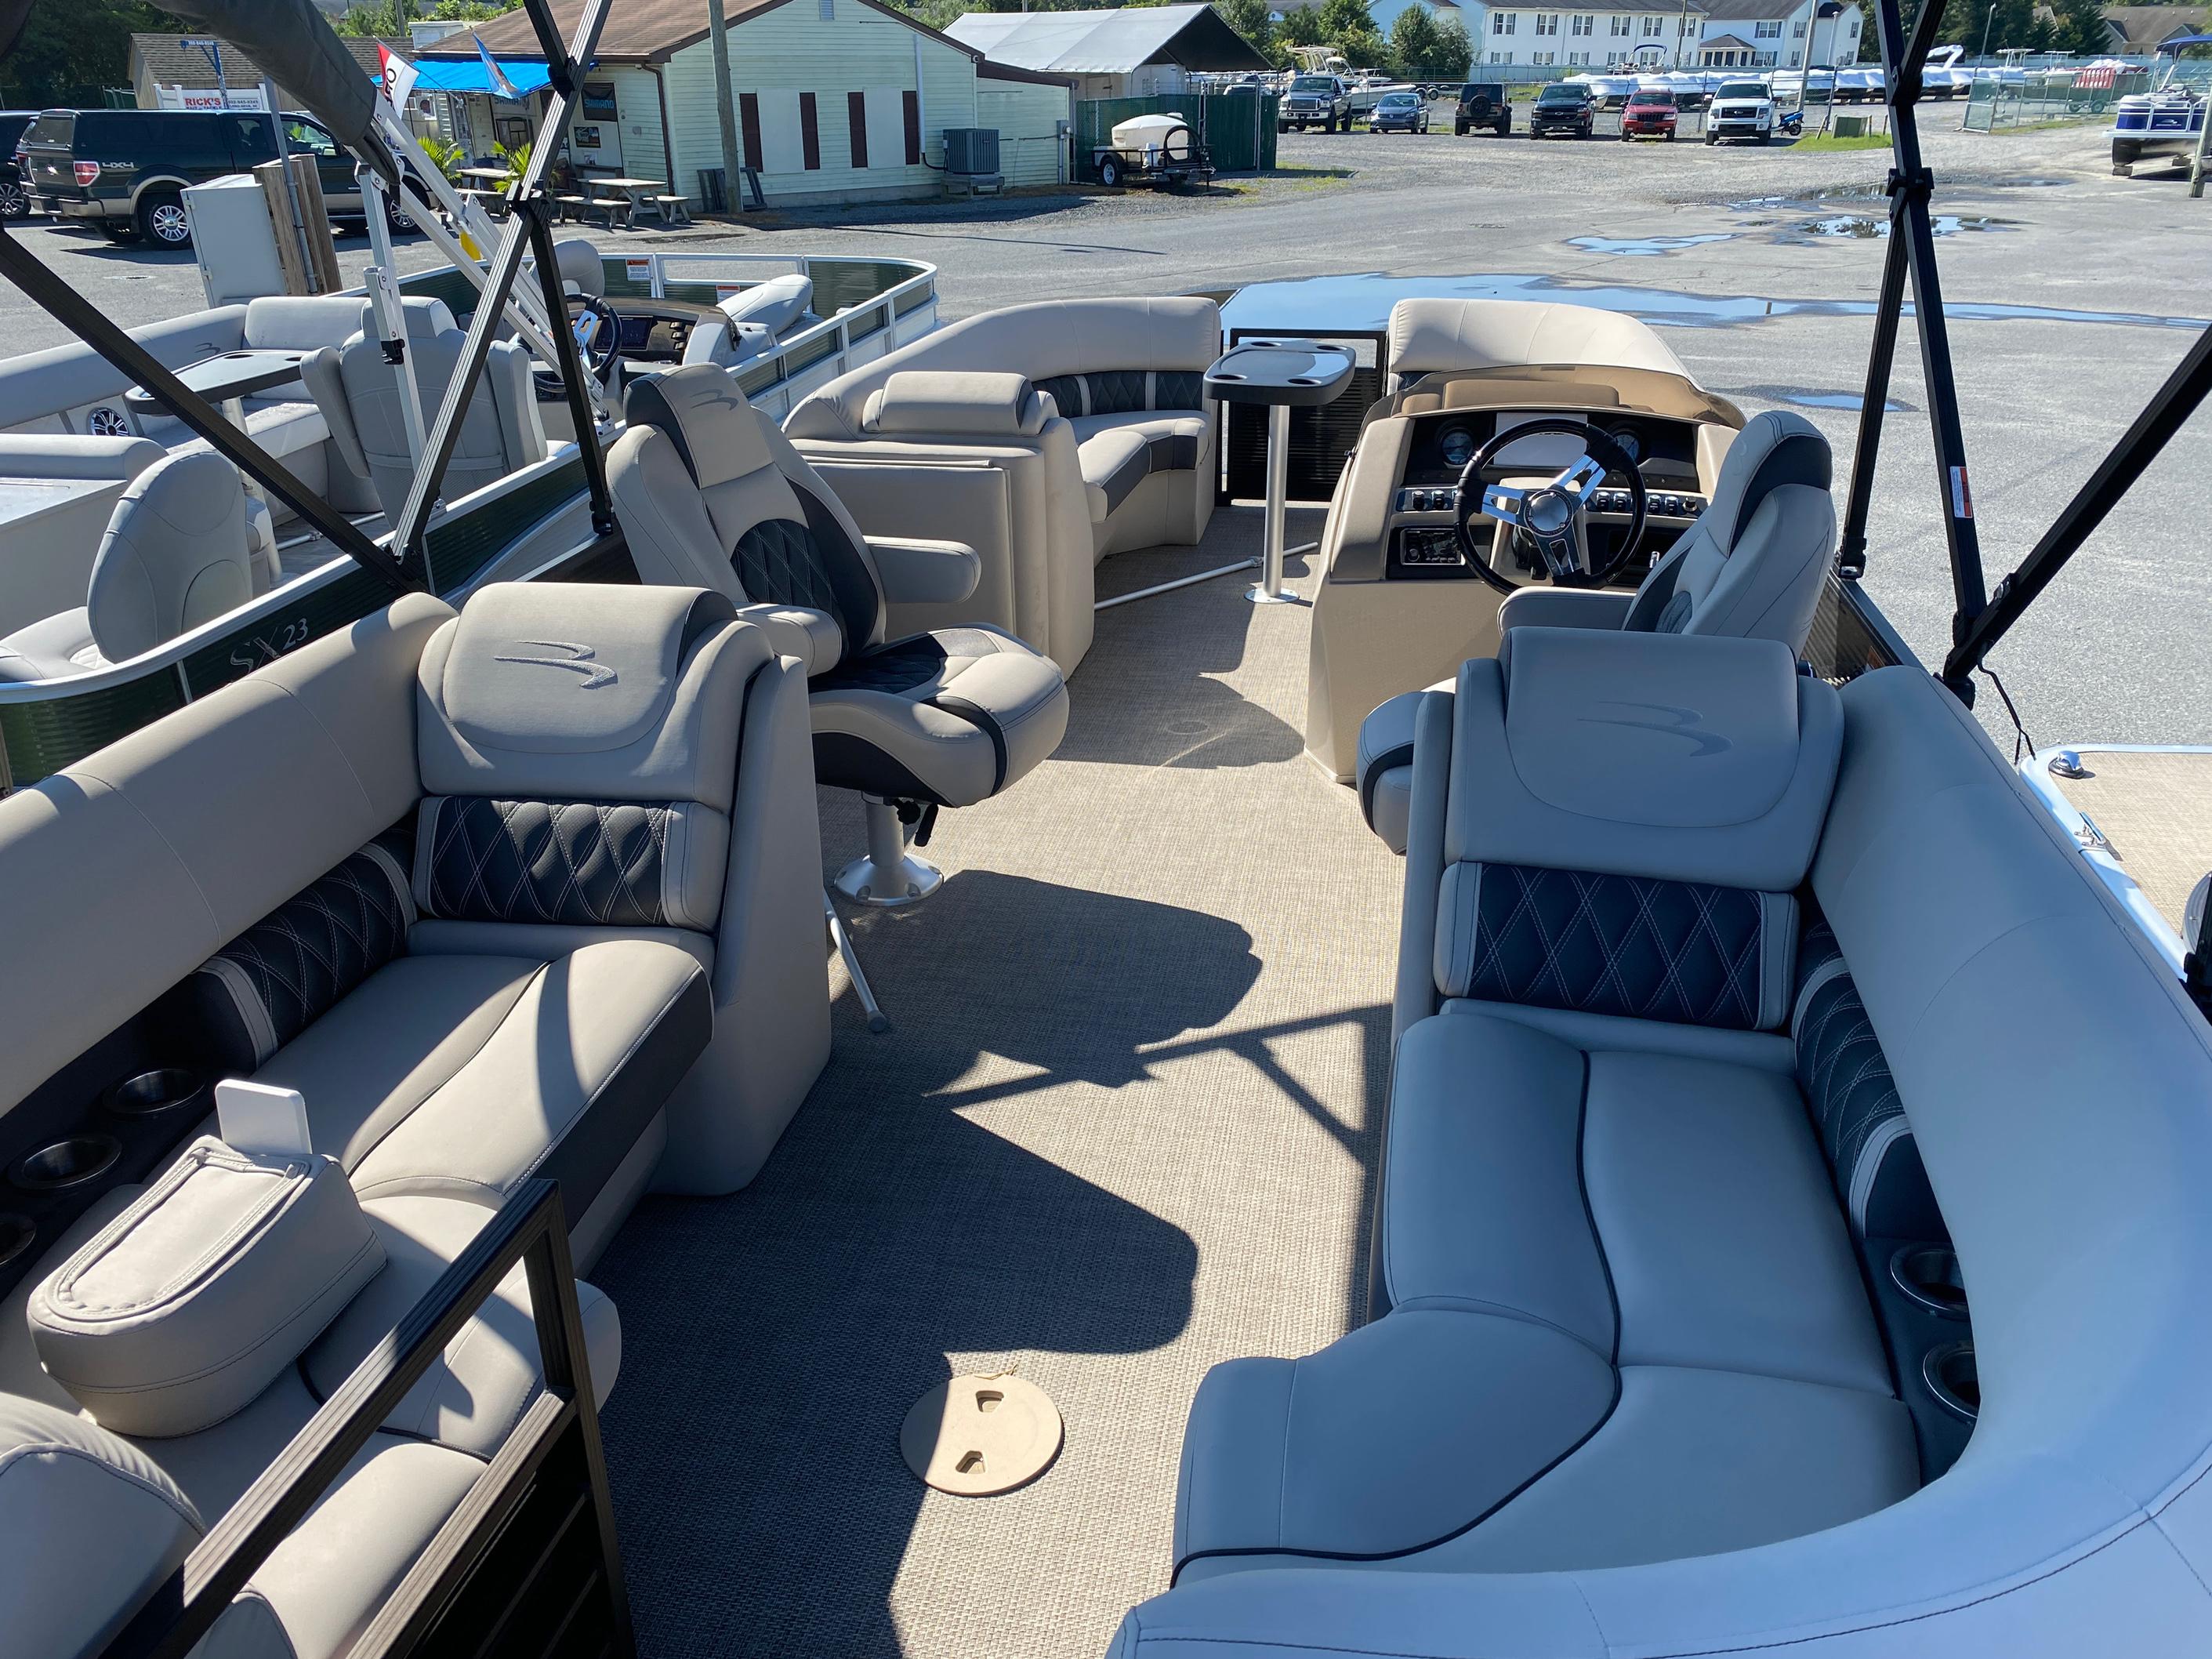 2019 Bennington boat for sale, model of the boat is 23 GSR & Image # 6 of 10